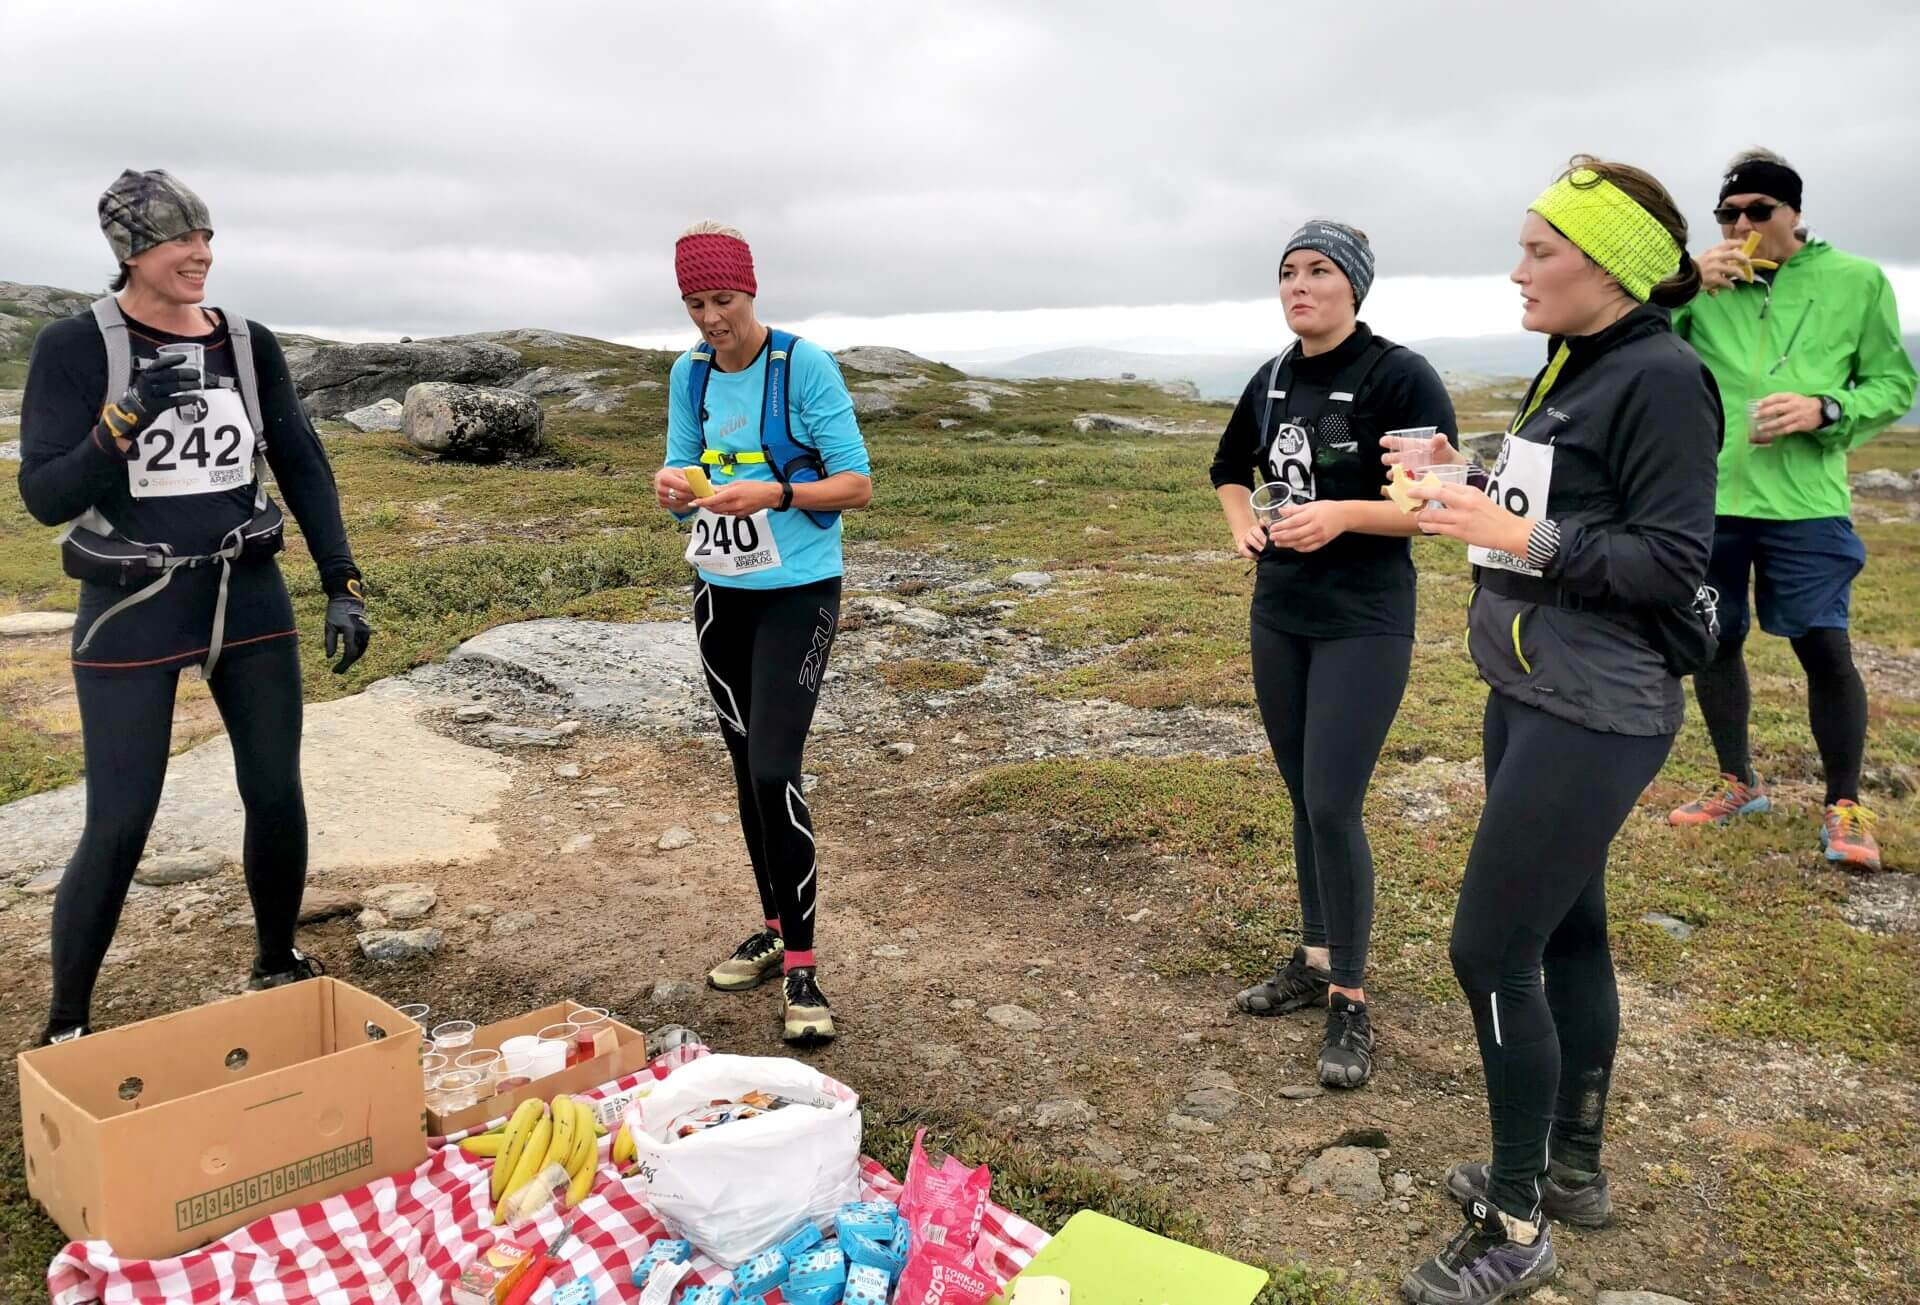 Arctic Circle Race 2019 Polcirkelloppet Guijaure kontr Anna K m fl